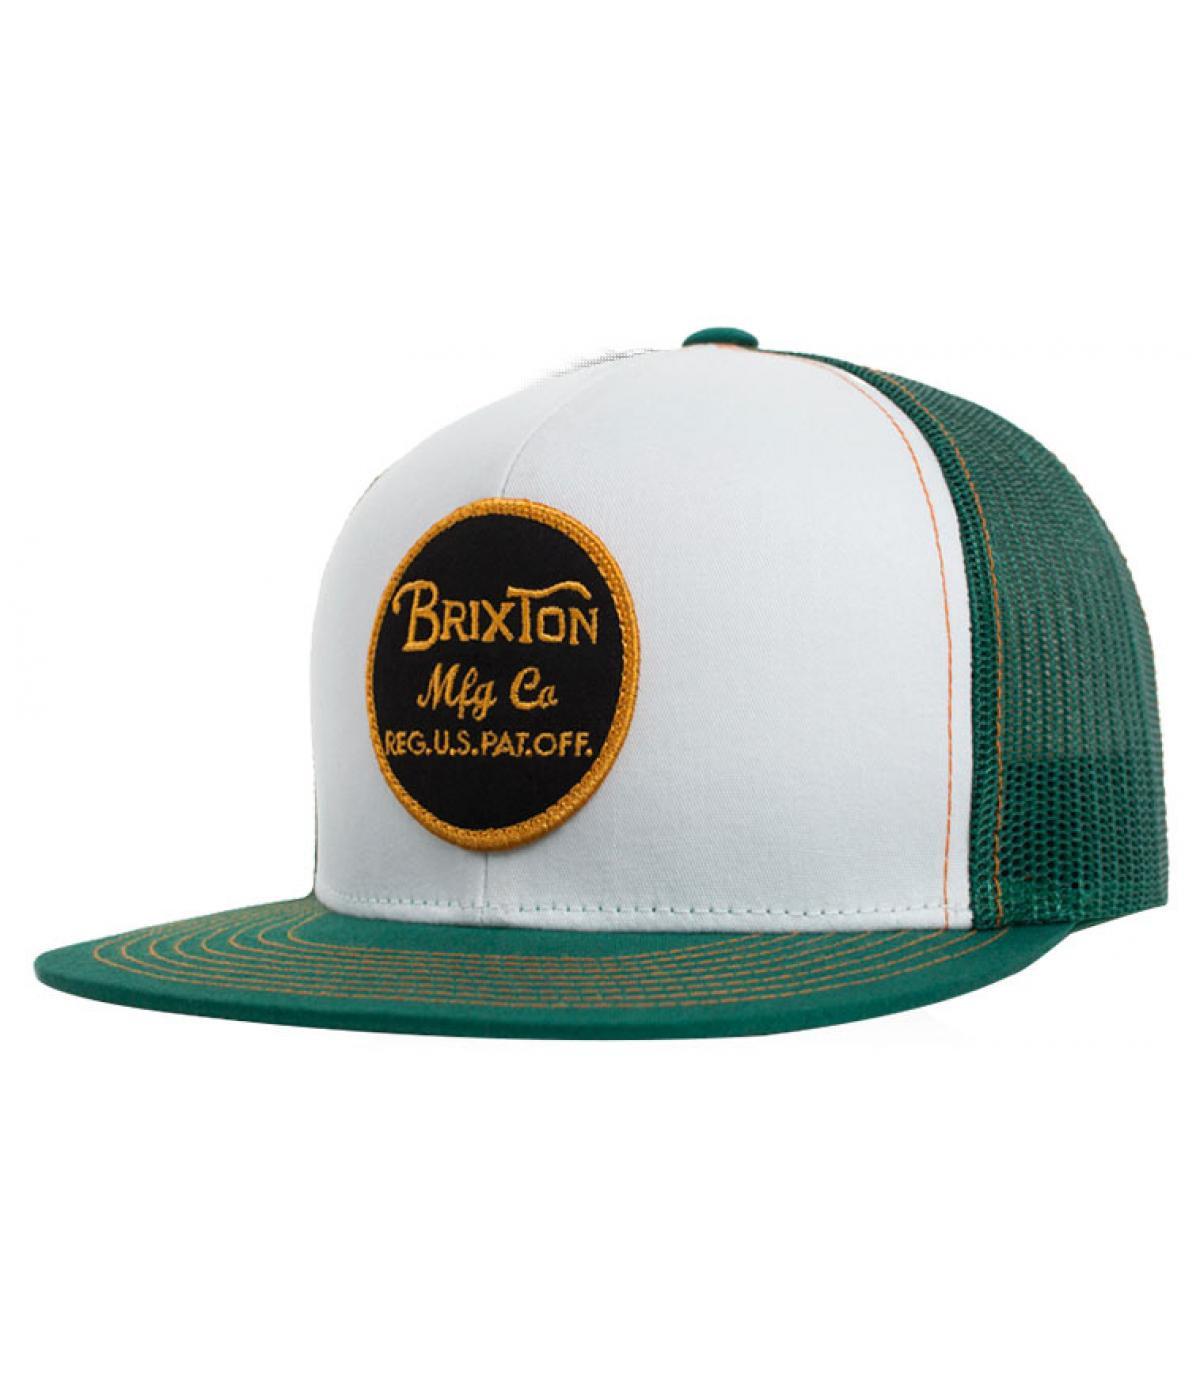 Brixton white green trucker